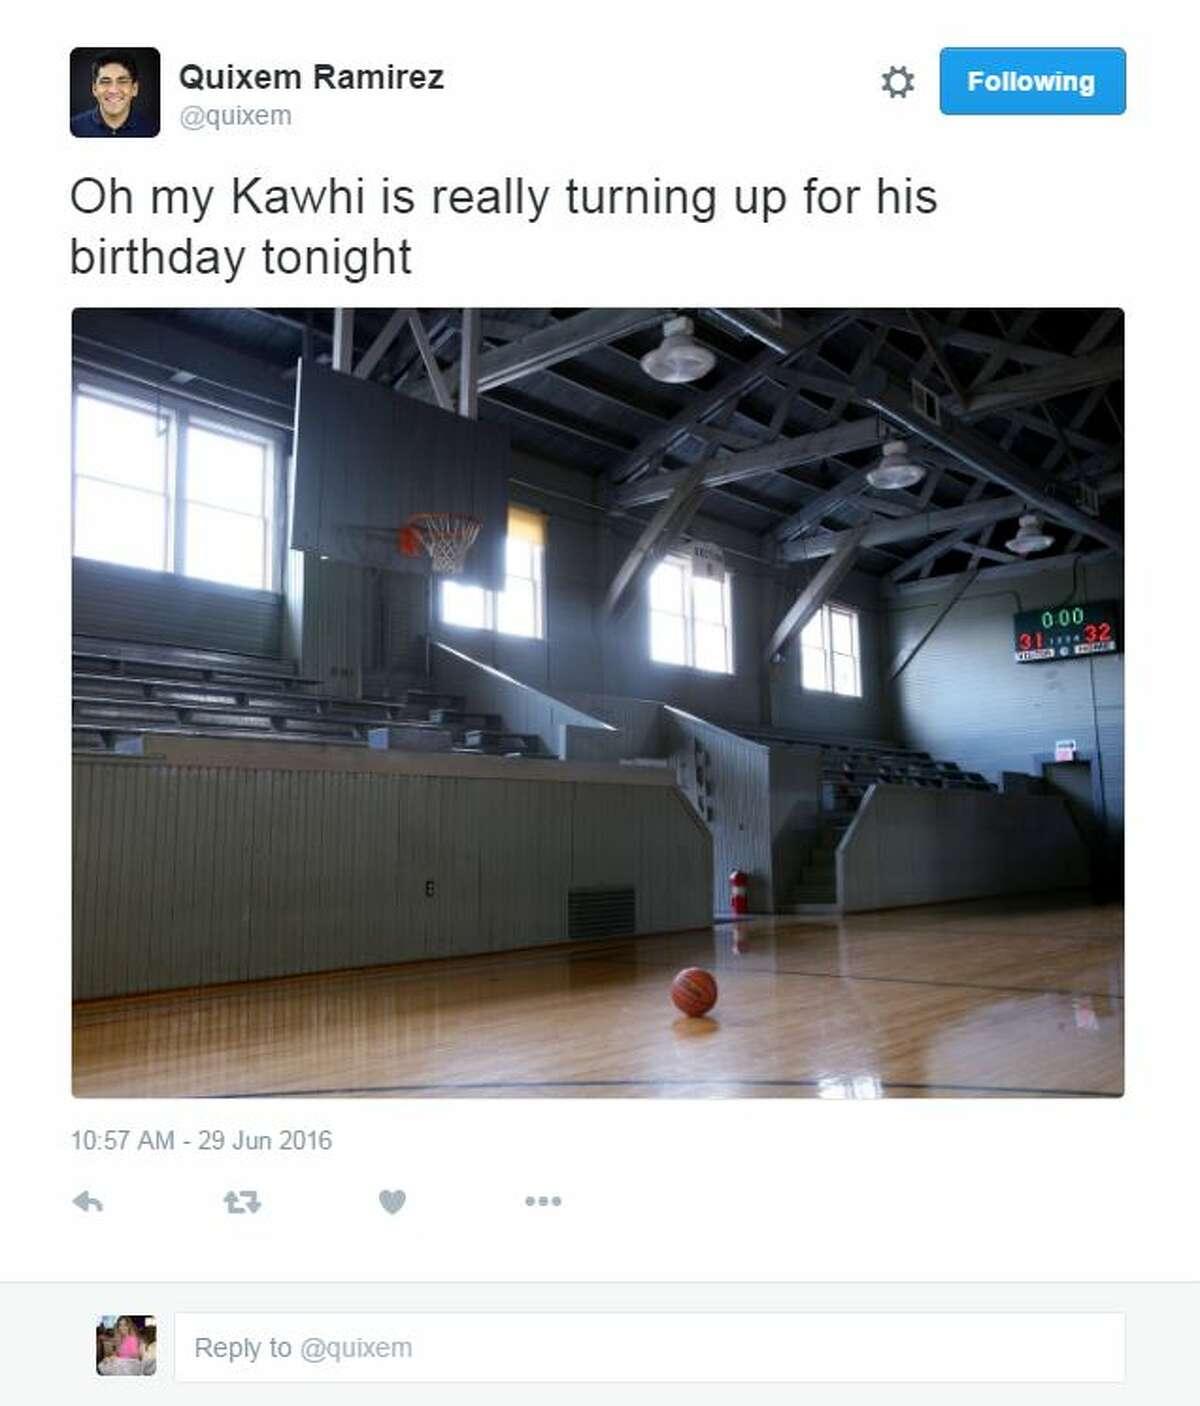 Play basketball: By himself, naturally.